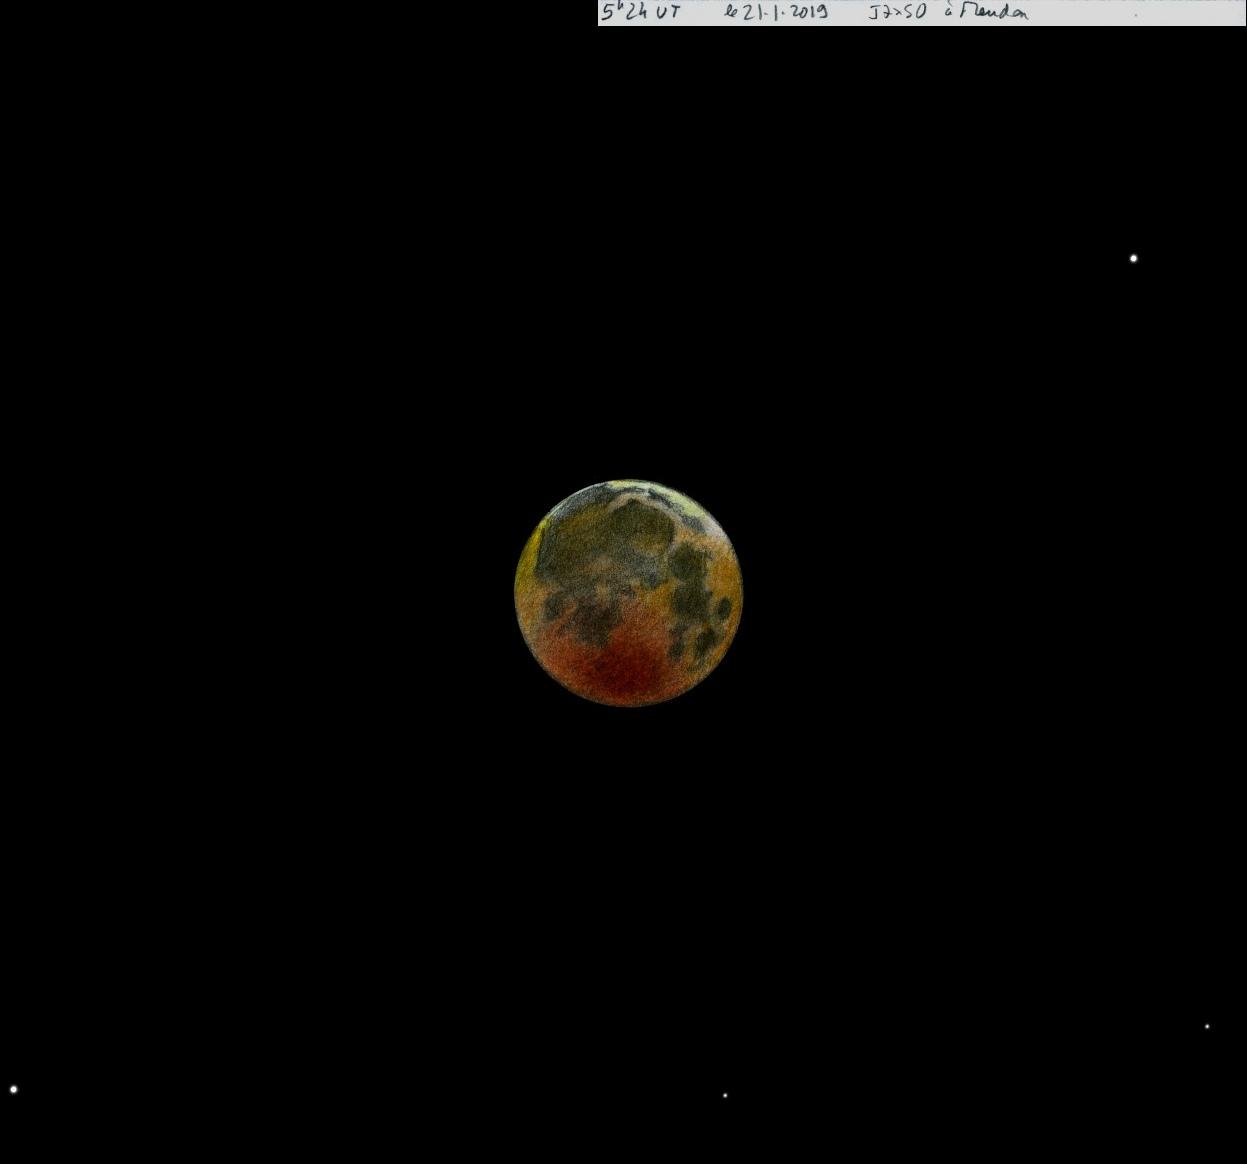 eclipse-lune210119-5h24-j7x50.jpg.8219de5fc150e8a8473875fb105e508f.jpg